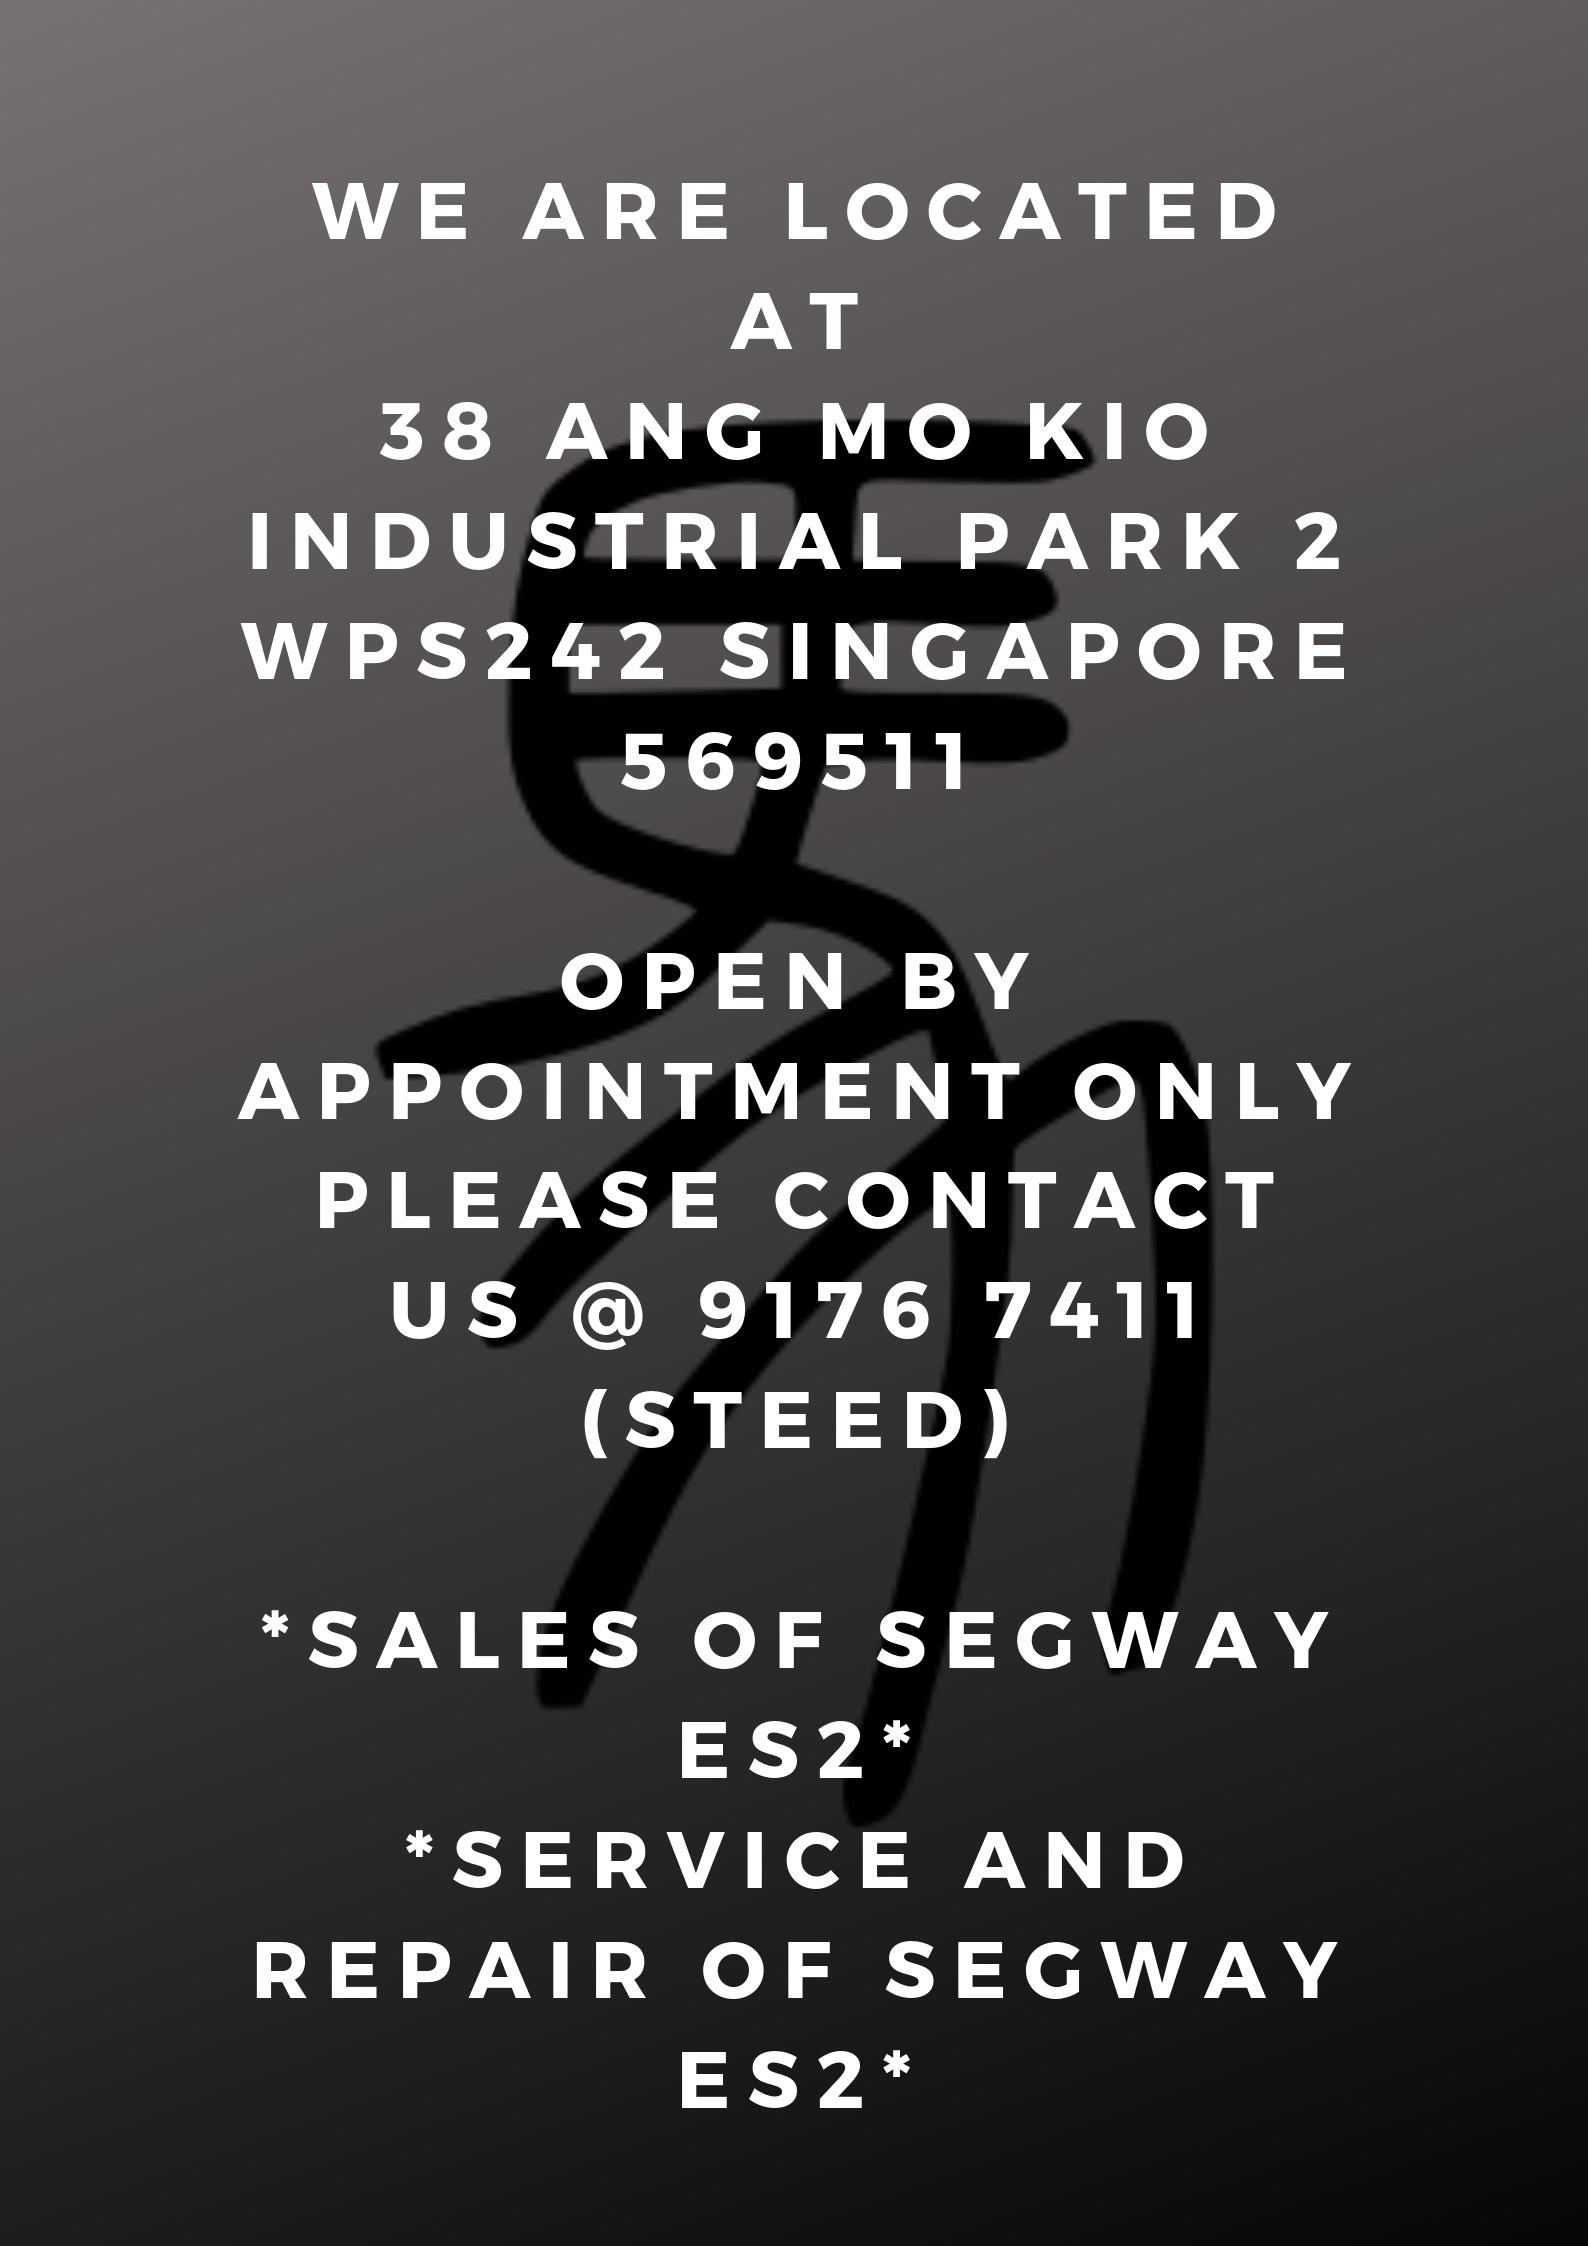 Segway Kickscooter ES2 (UL2272 certified, LTA Compliant, 1 Year Limited  Manufacturer Warranty